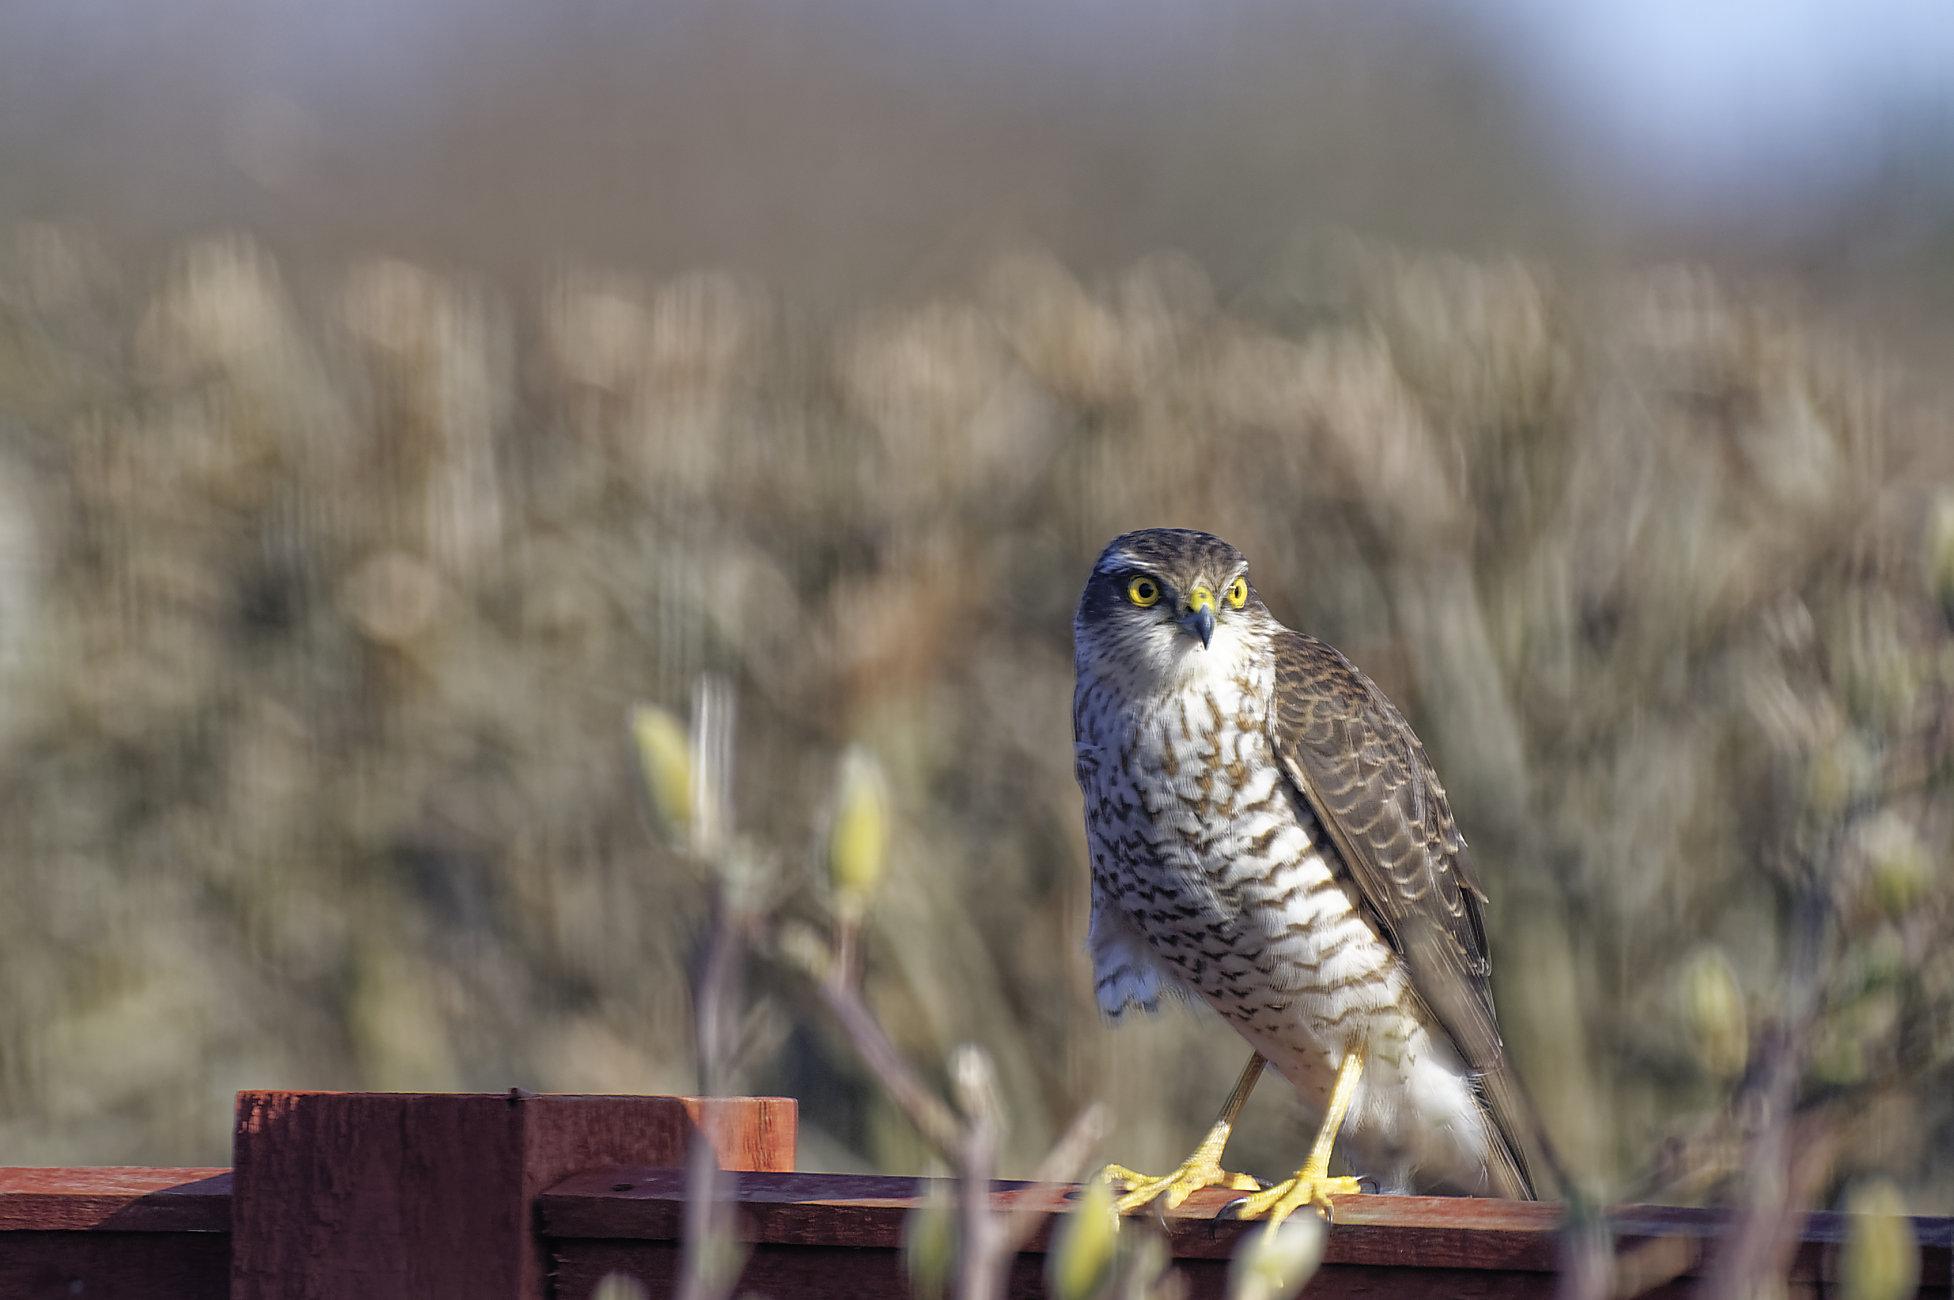 Sparrowhawk on the fence